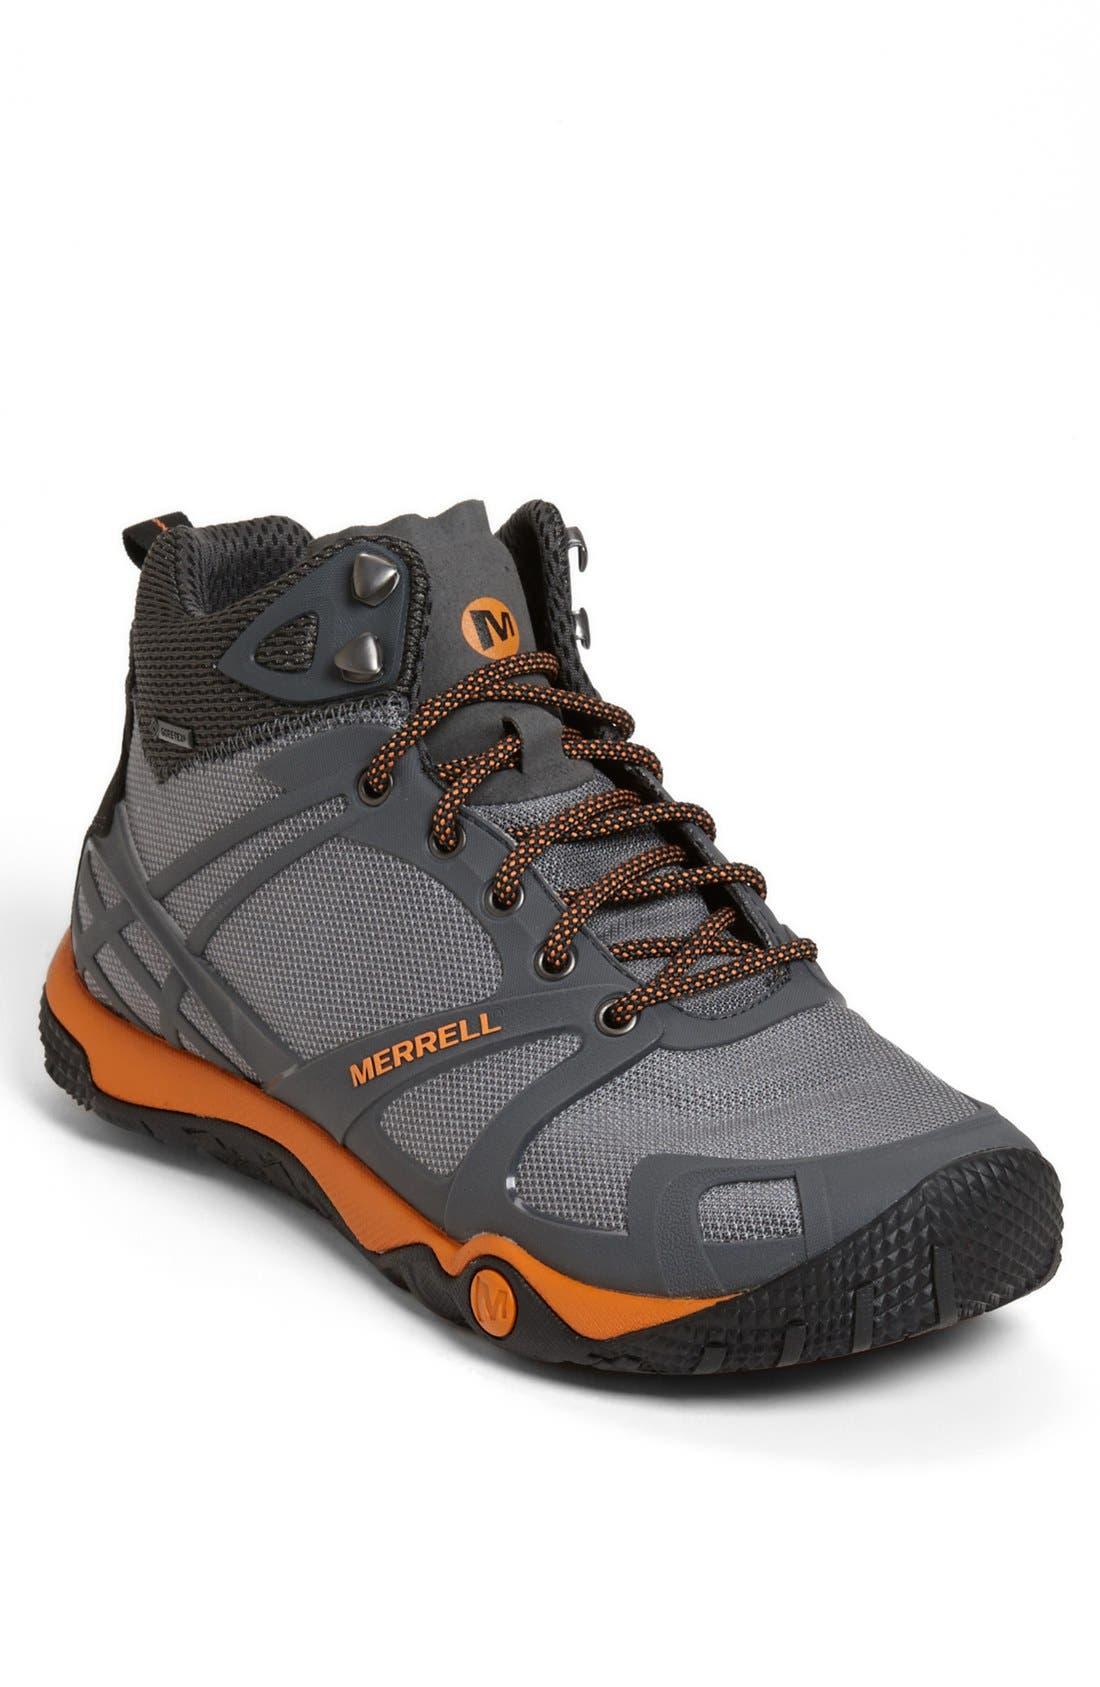 Alternate Image 1 Selected - Merrell 'Proterra Mid Sport' Waterproof Hiking Boot (Men)